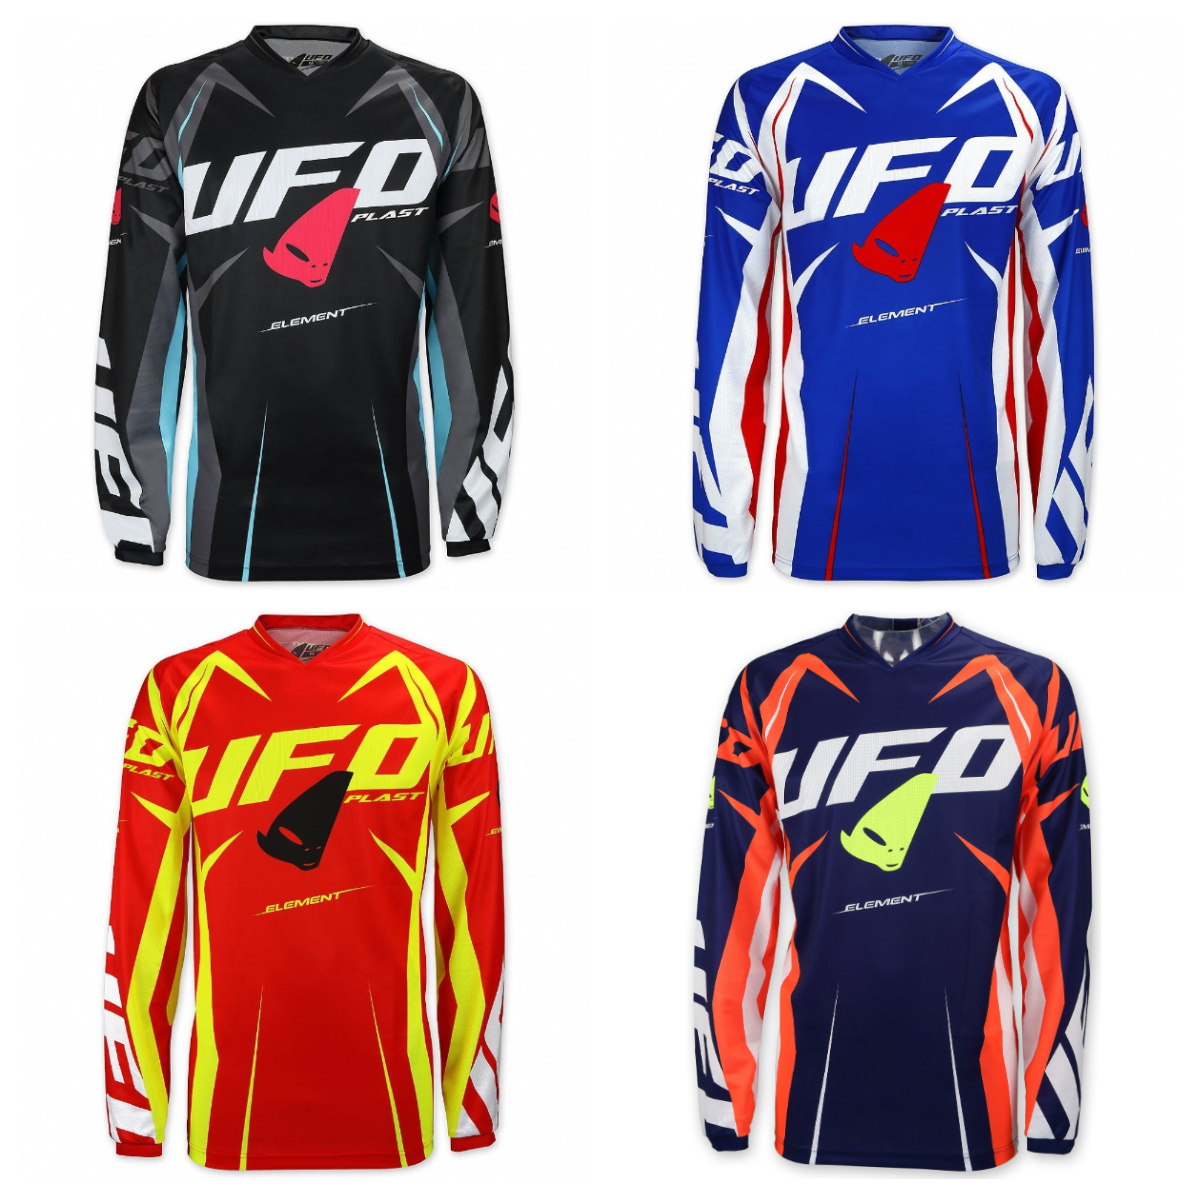 2019 Racing MAVIC Downhill Jersey Mountain Bike Motorcycle Cycling Crossmax Shirt Ciclismo Clothes Blackhawks